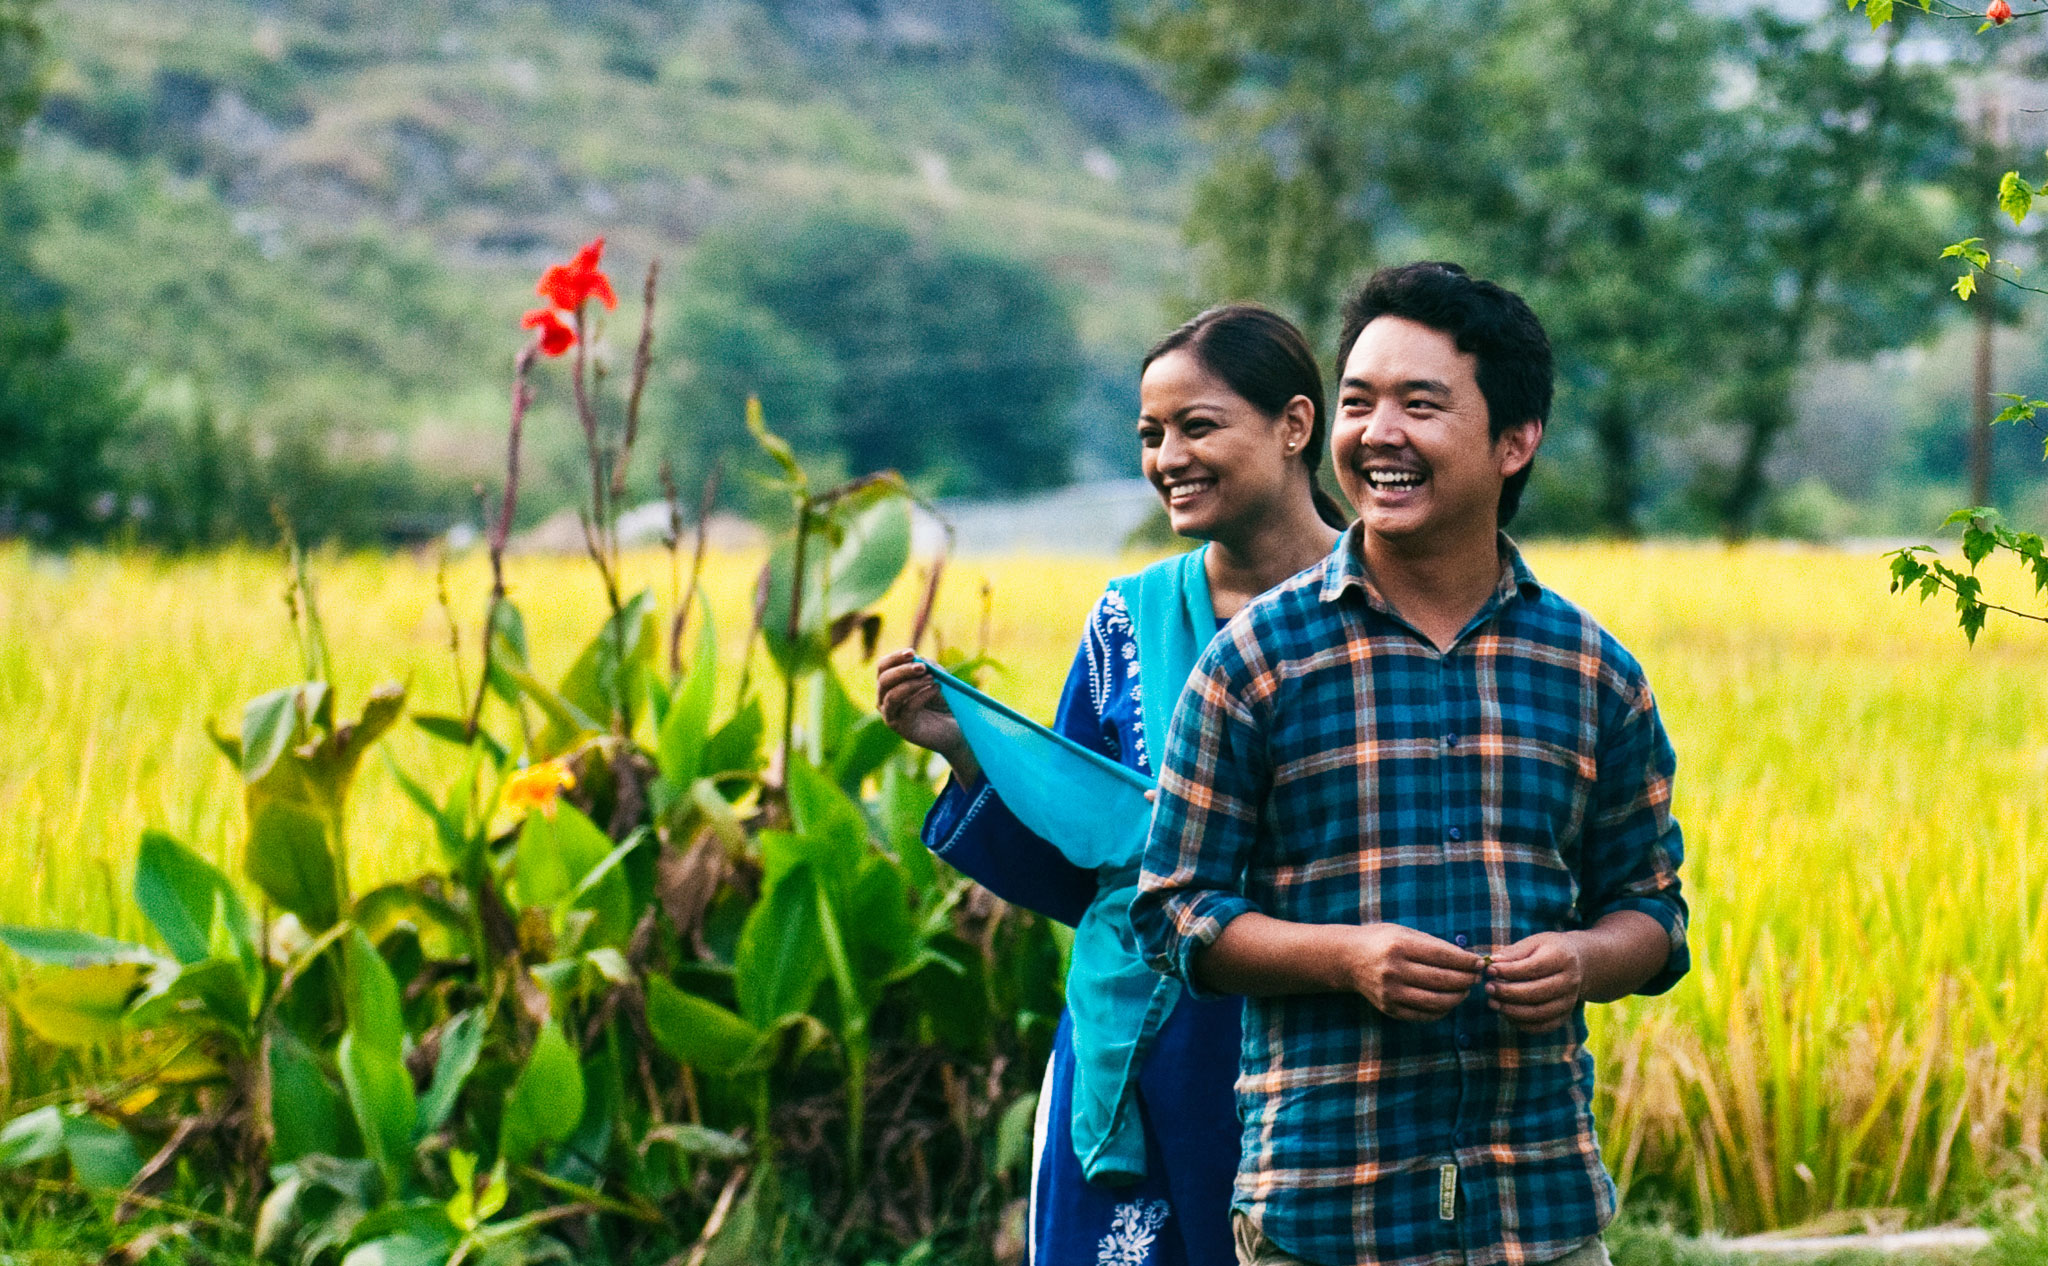 Nepali actress Reecha Sharma and Nepali stage actor Tika Bhakta Jirel enjoying a laugh during a break from filming of 'Nine Million Stars'.   Image courtesy of Jan Kath.